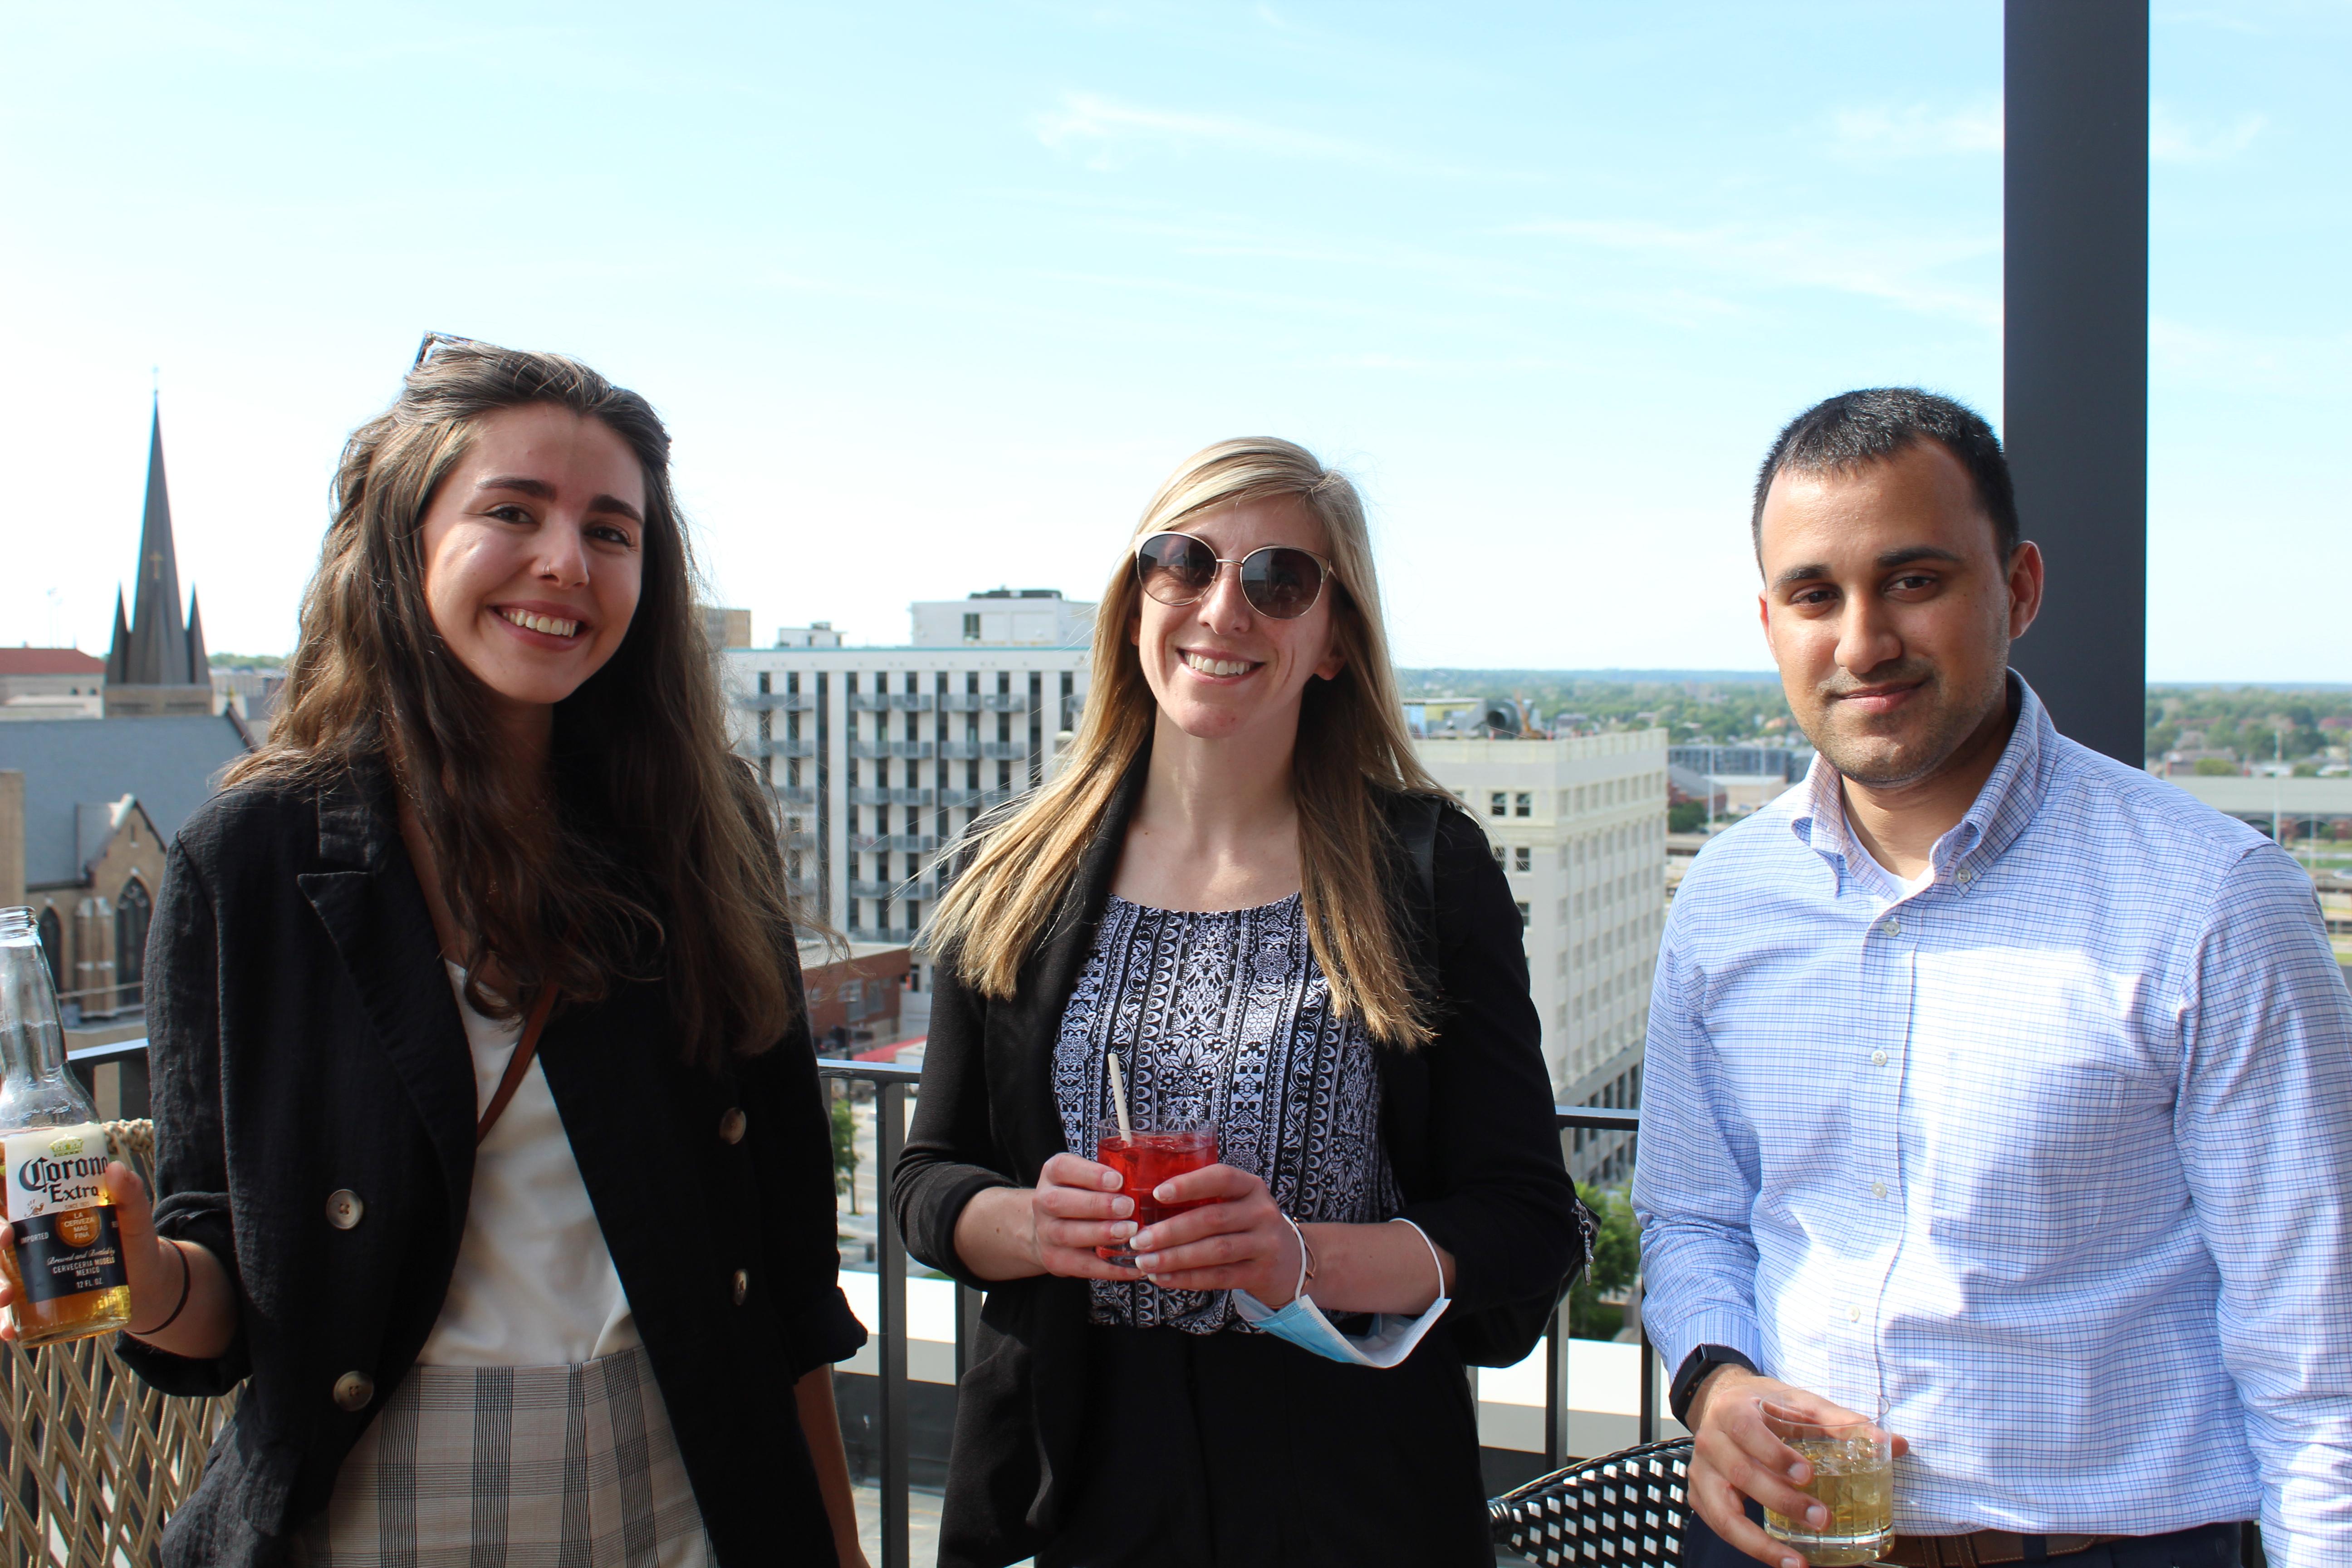 Modus Coworking Offices team members Emma Johnson, Laura Schoening and Rahul Agarwal enjoy a drink. (David Golbitz/Daily Record)